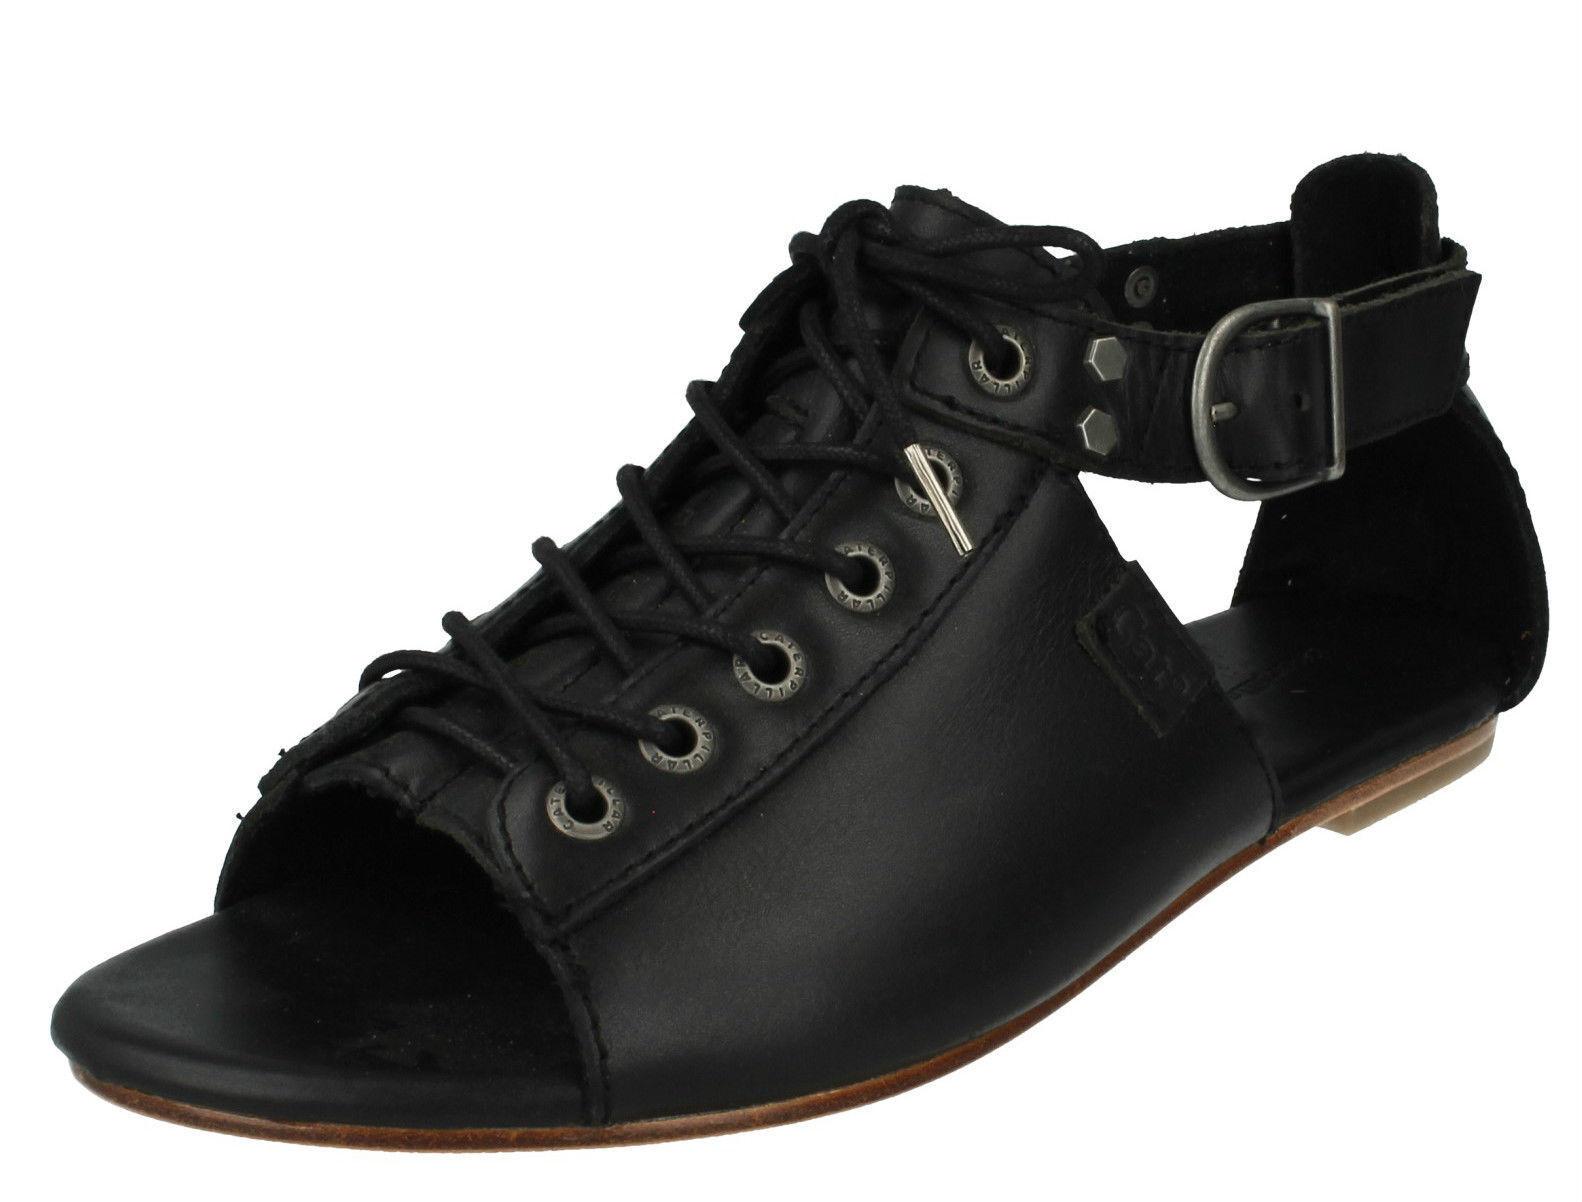 Caterpillar MEGHAN P305538 Ladies Black Leather Flat Sandals (36B) (Kett)